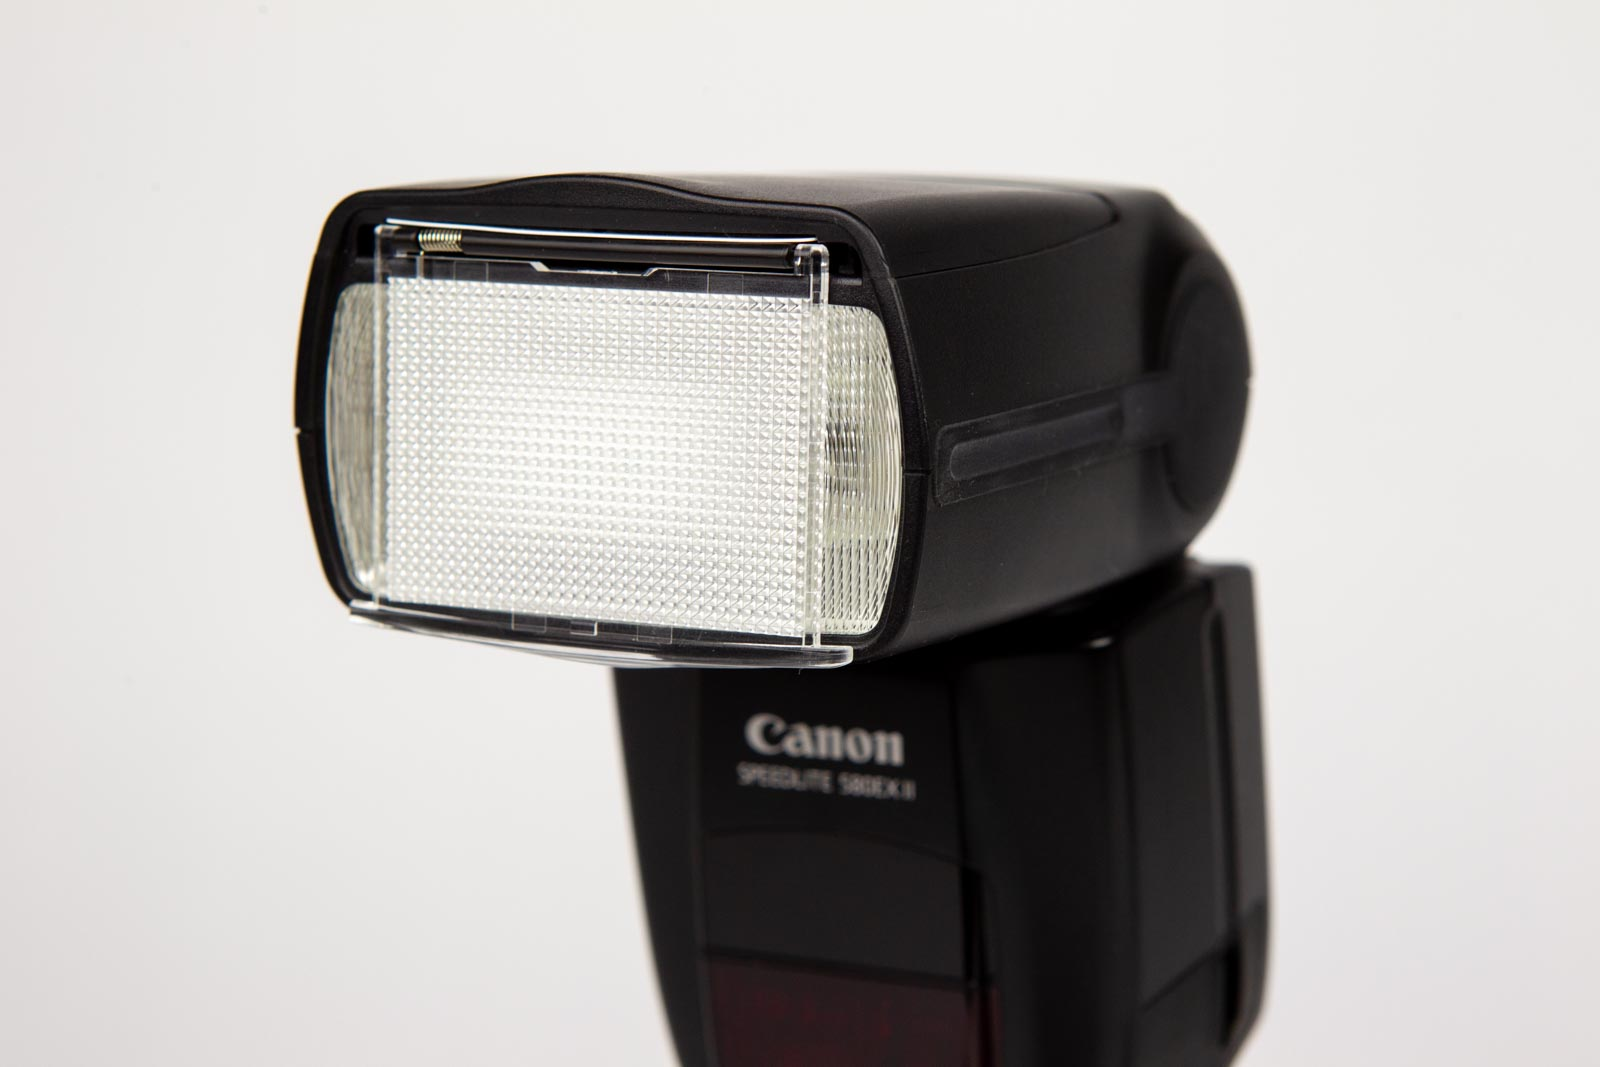 Externe flitser op een camera gekanteld met groothoekadapter